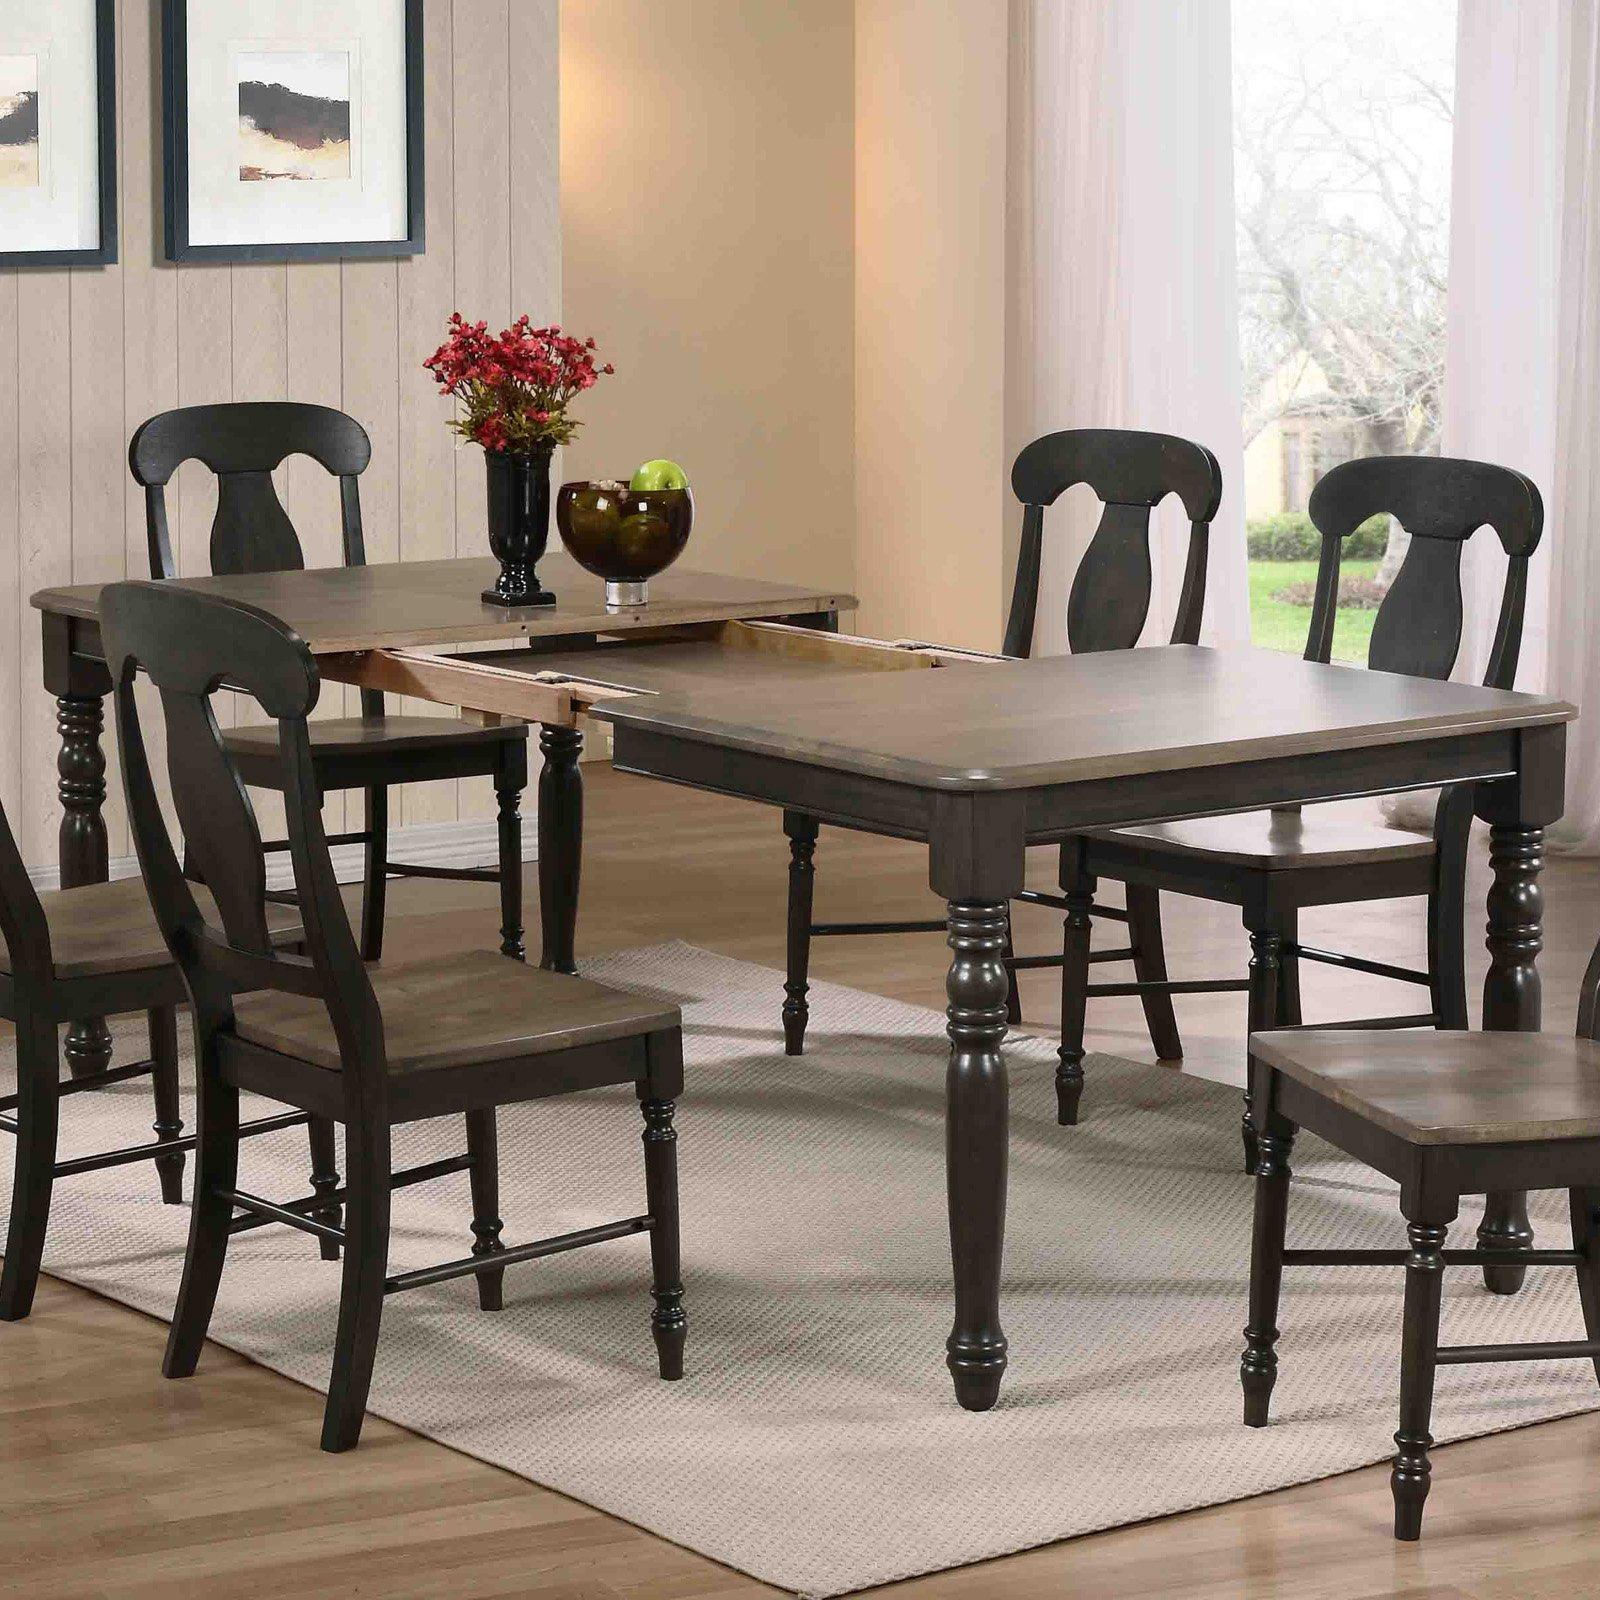 Iconic Furniture Turned Leg Rectangular Dining Table